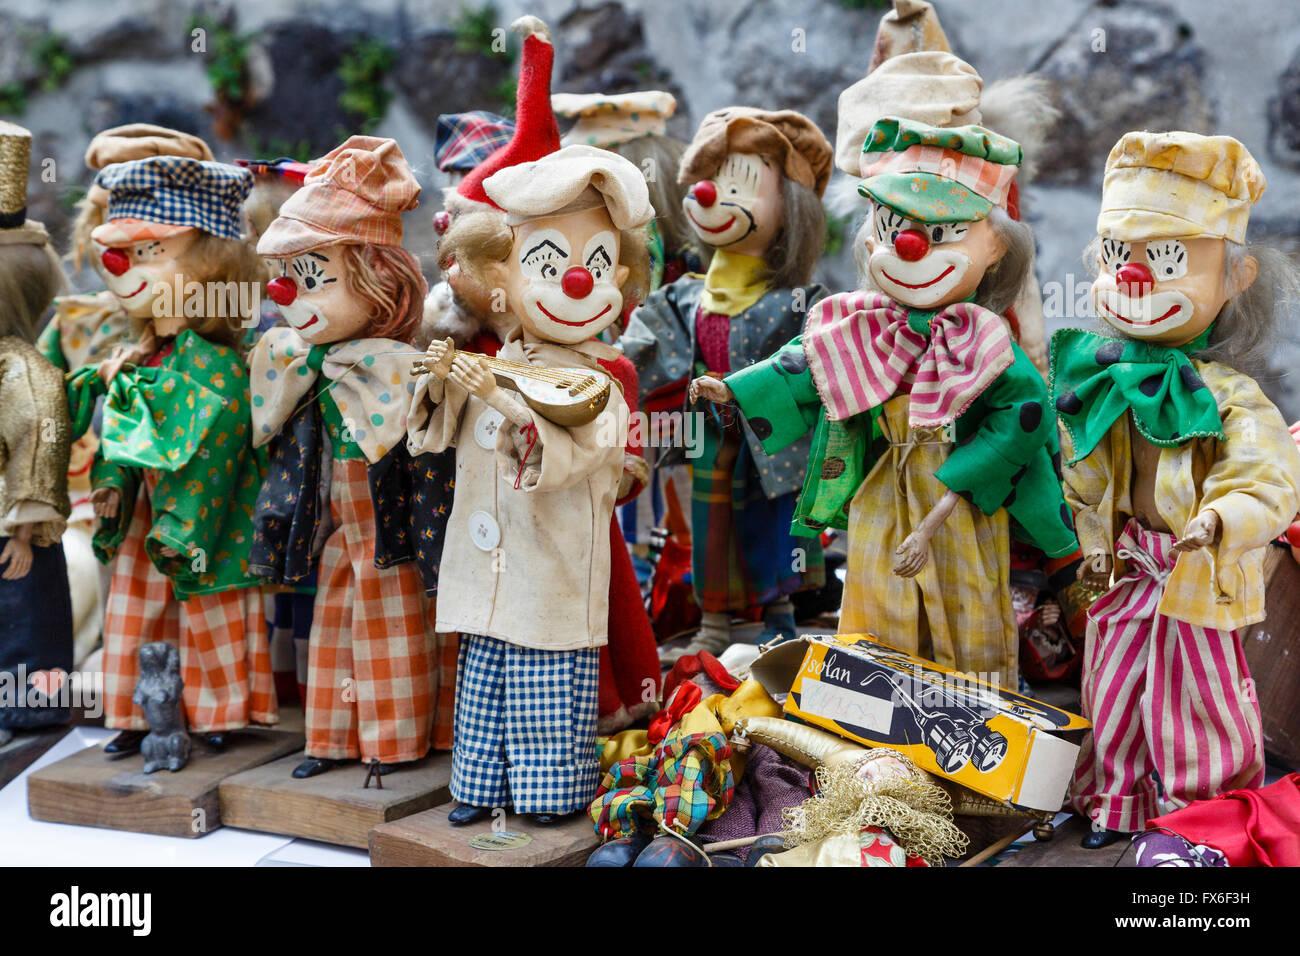 Clown dolls on sale at a vide-grenier in Allègre, Haute